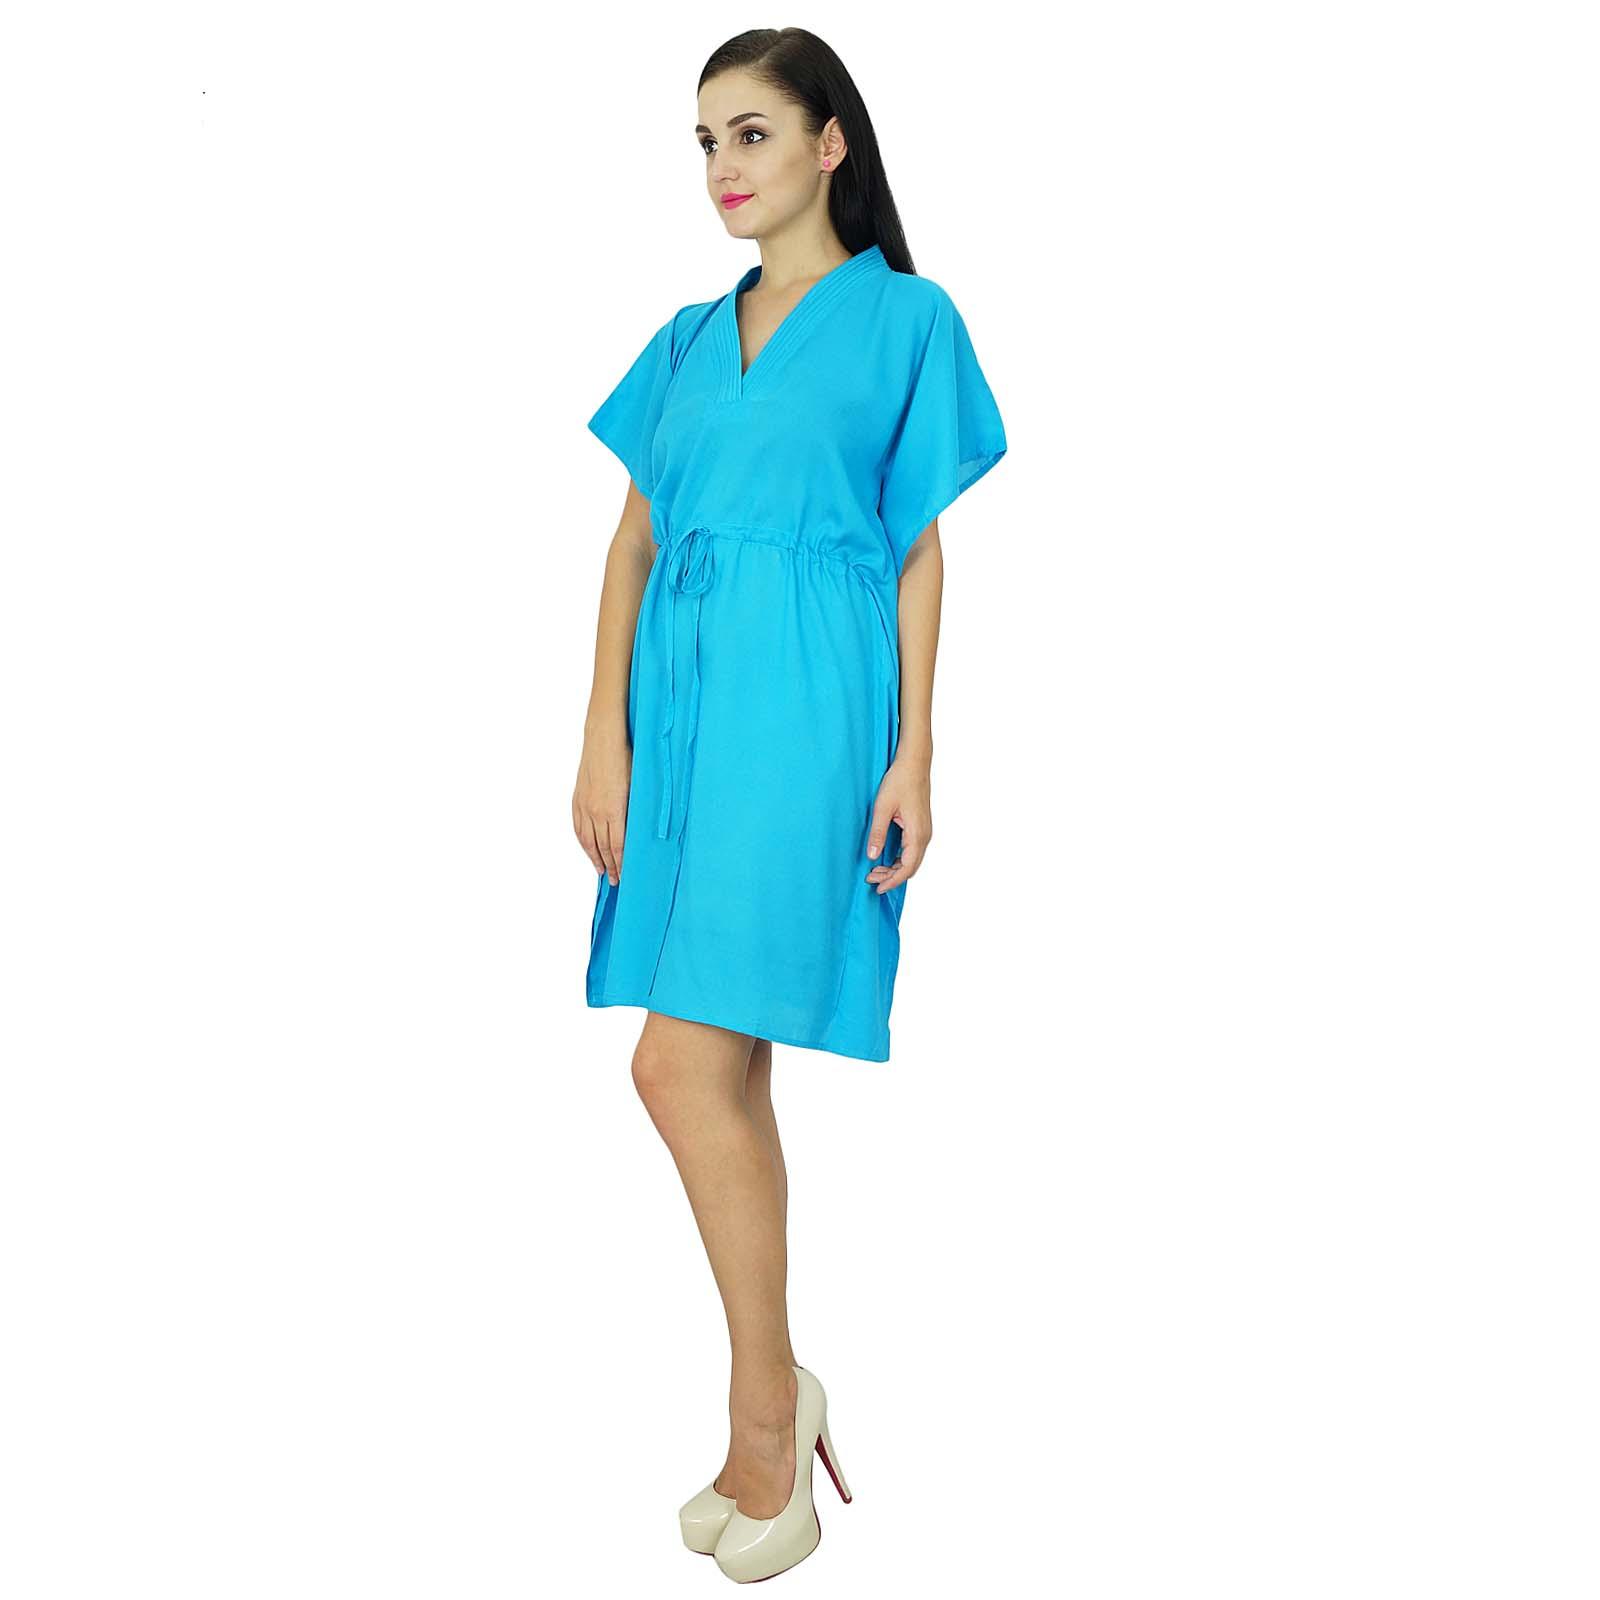 thumbnail 4 - Bimba Women Plain Kaftan Dress Beach Cover Up Cotton Solid Caftan-58z